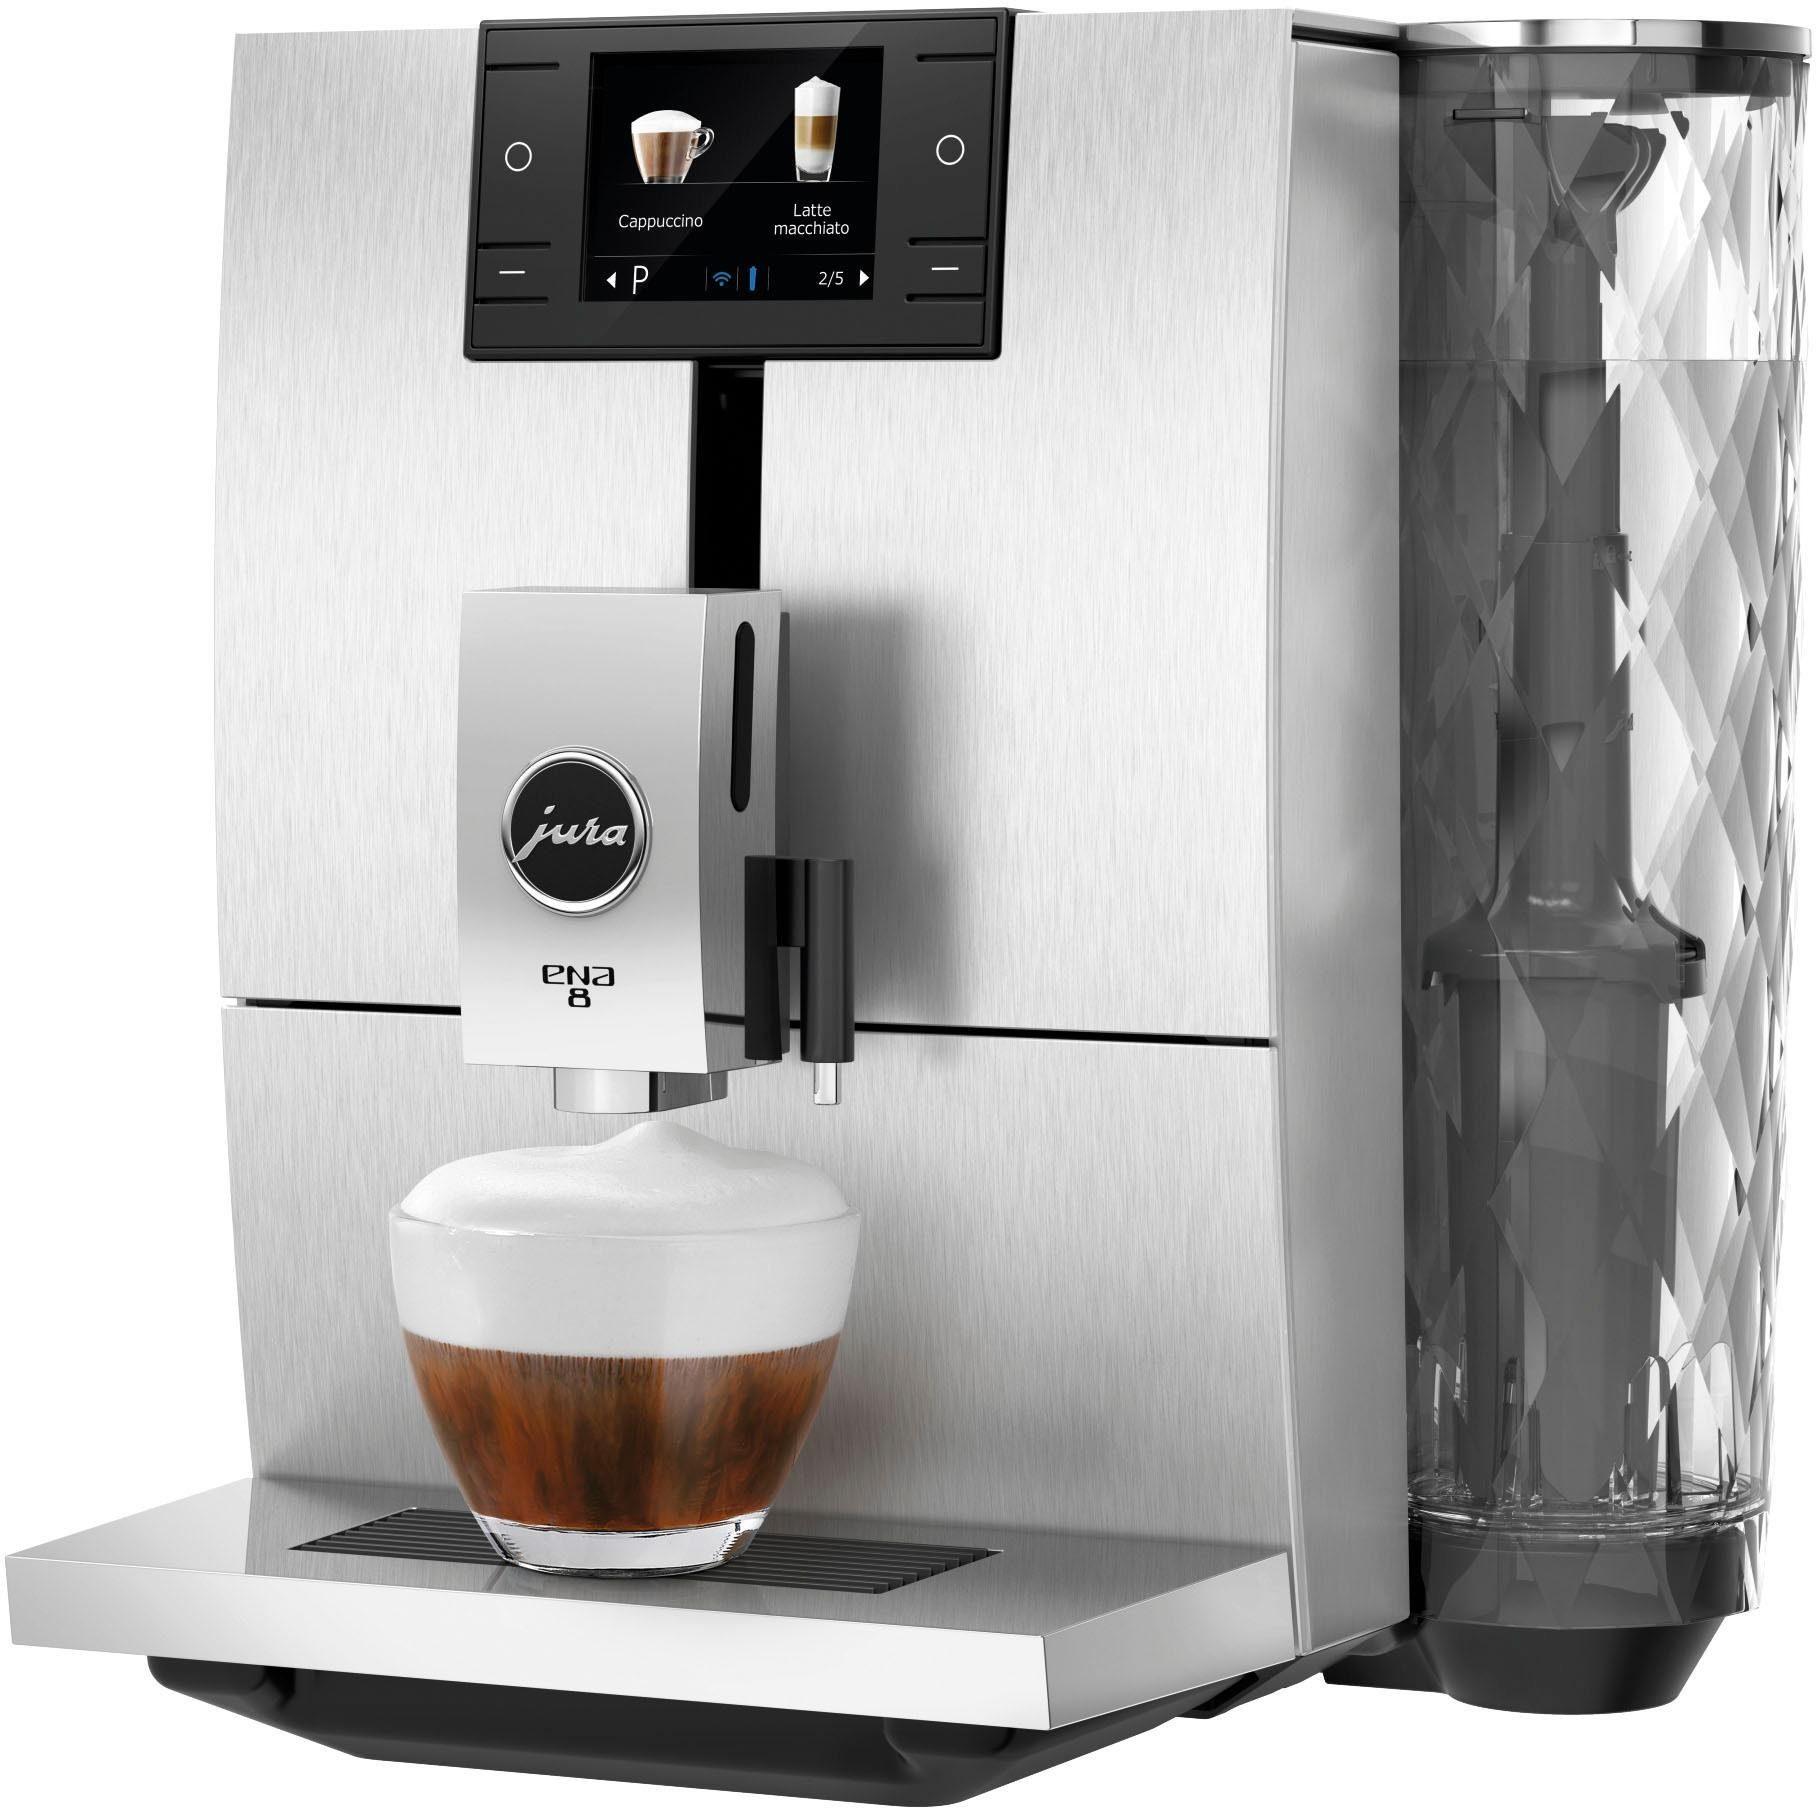 JURA Kaffeevollautomat ENA 8 Signature Line, Wireless ready und kompatibel mit JURA App J.O.E.®, Smart Connect im Lieferumfang enthalten